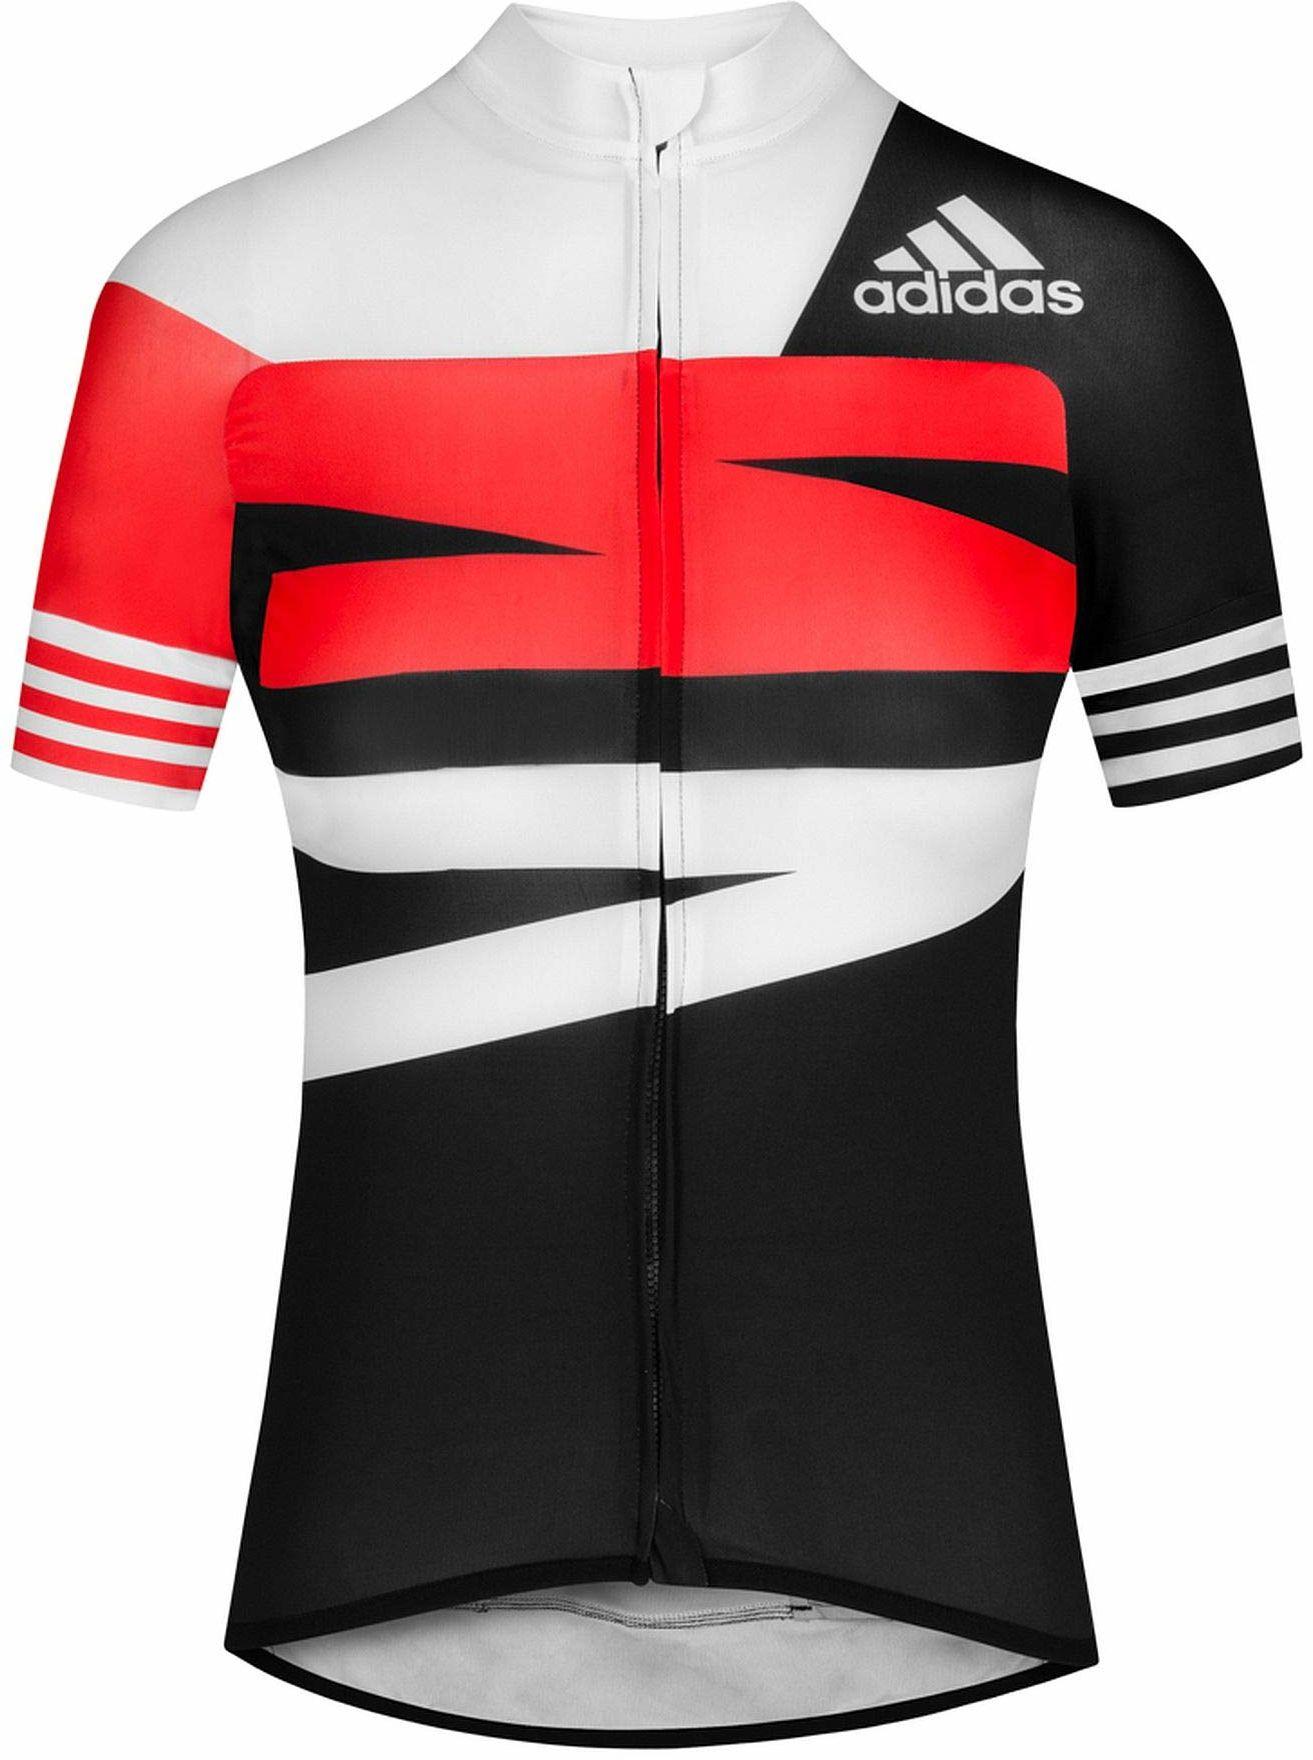 adidas Damska koszulka Adistar Graphic Trikot, Hirere, XS